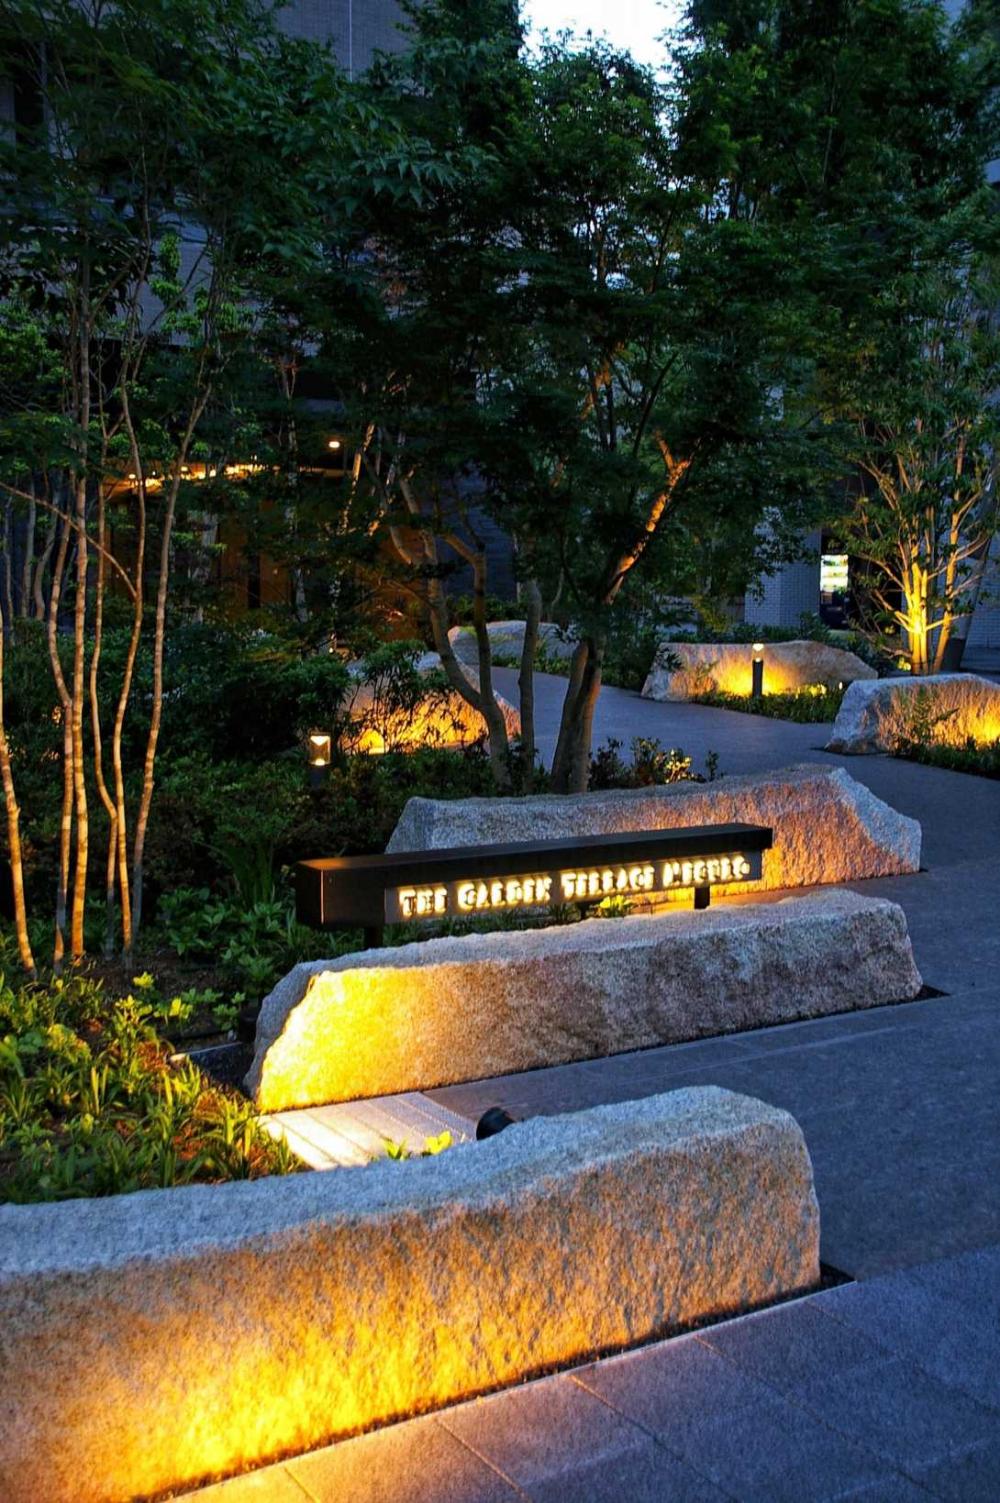 当代隐居 于闹市中享受自然生机 Ohtori Consultants Mooool木藕设计网 In 2020 Landscape Architecture Design Park Landscape Landscape Design